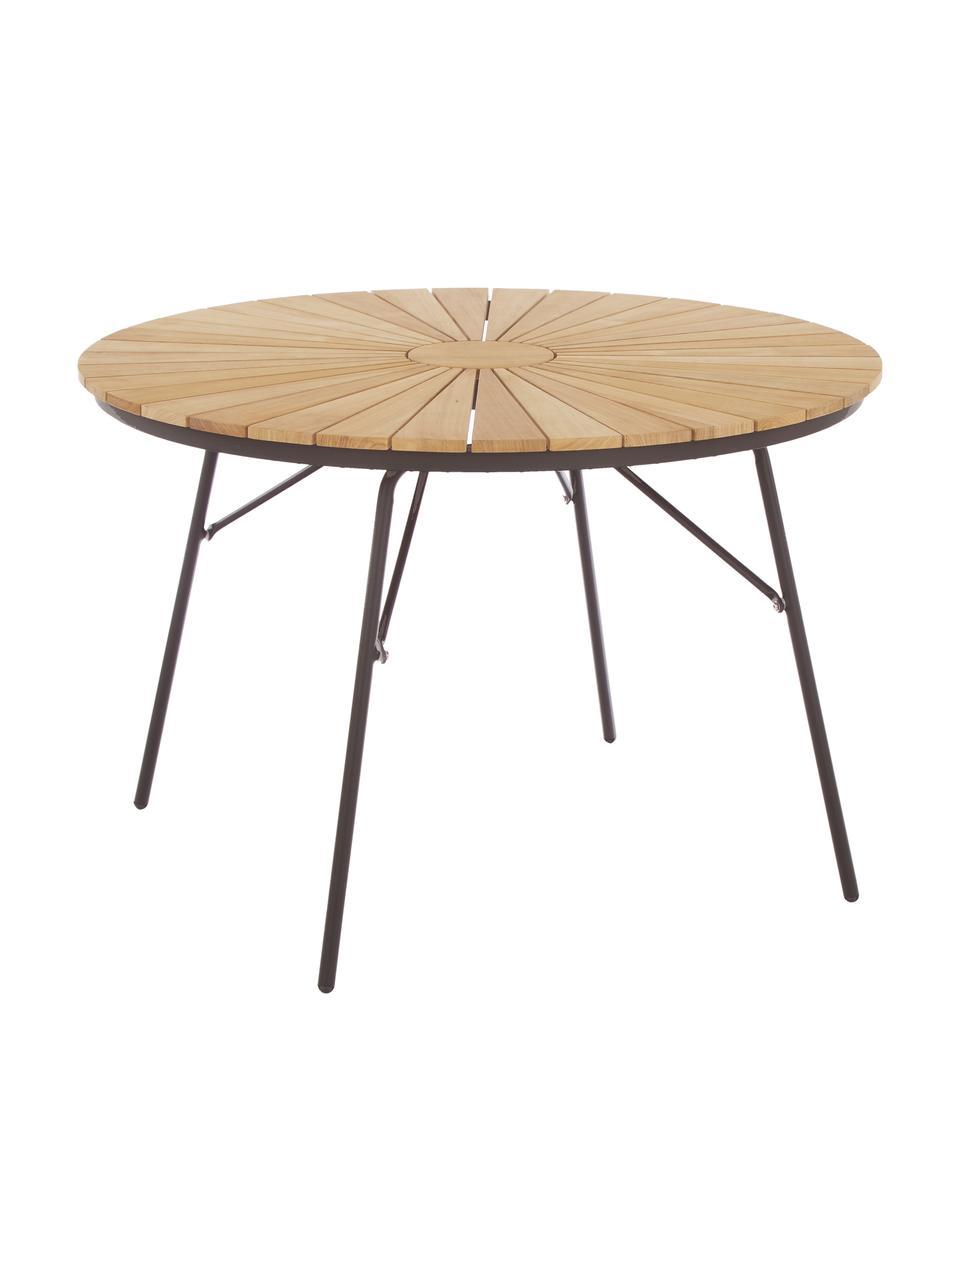 Table de jardin ronde en bois Hard & Ellen, Anthracite, teck